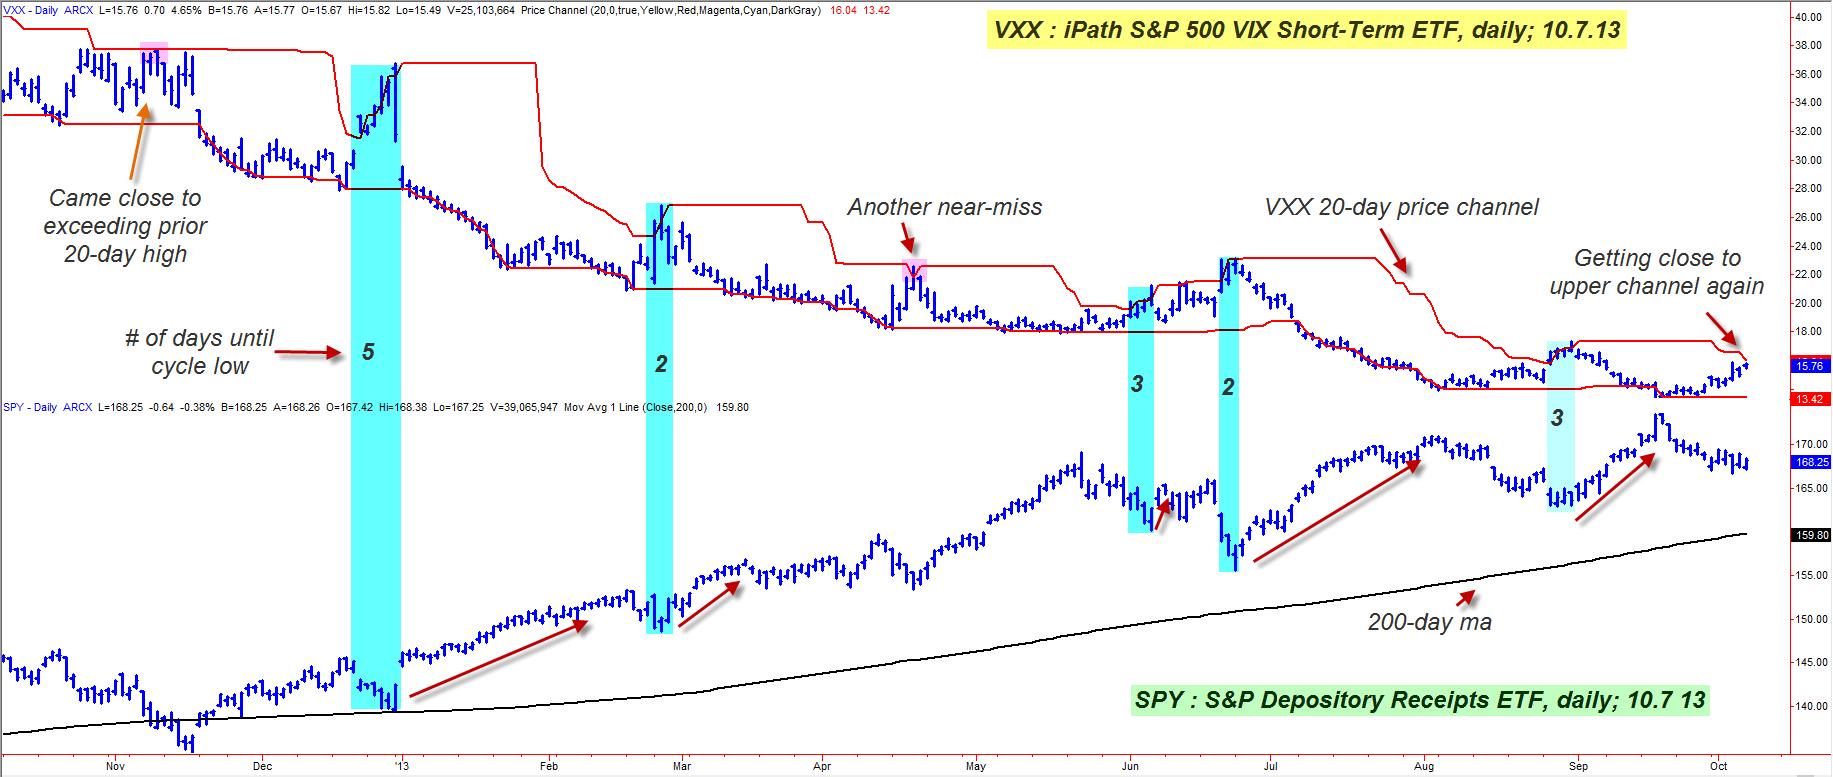 inverse relationship between vix and spx